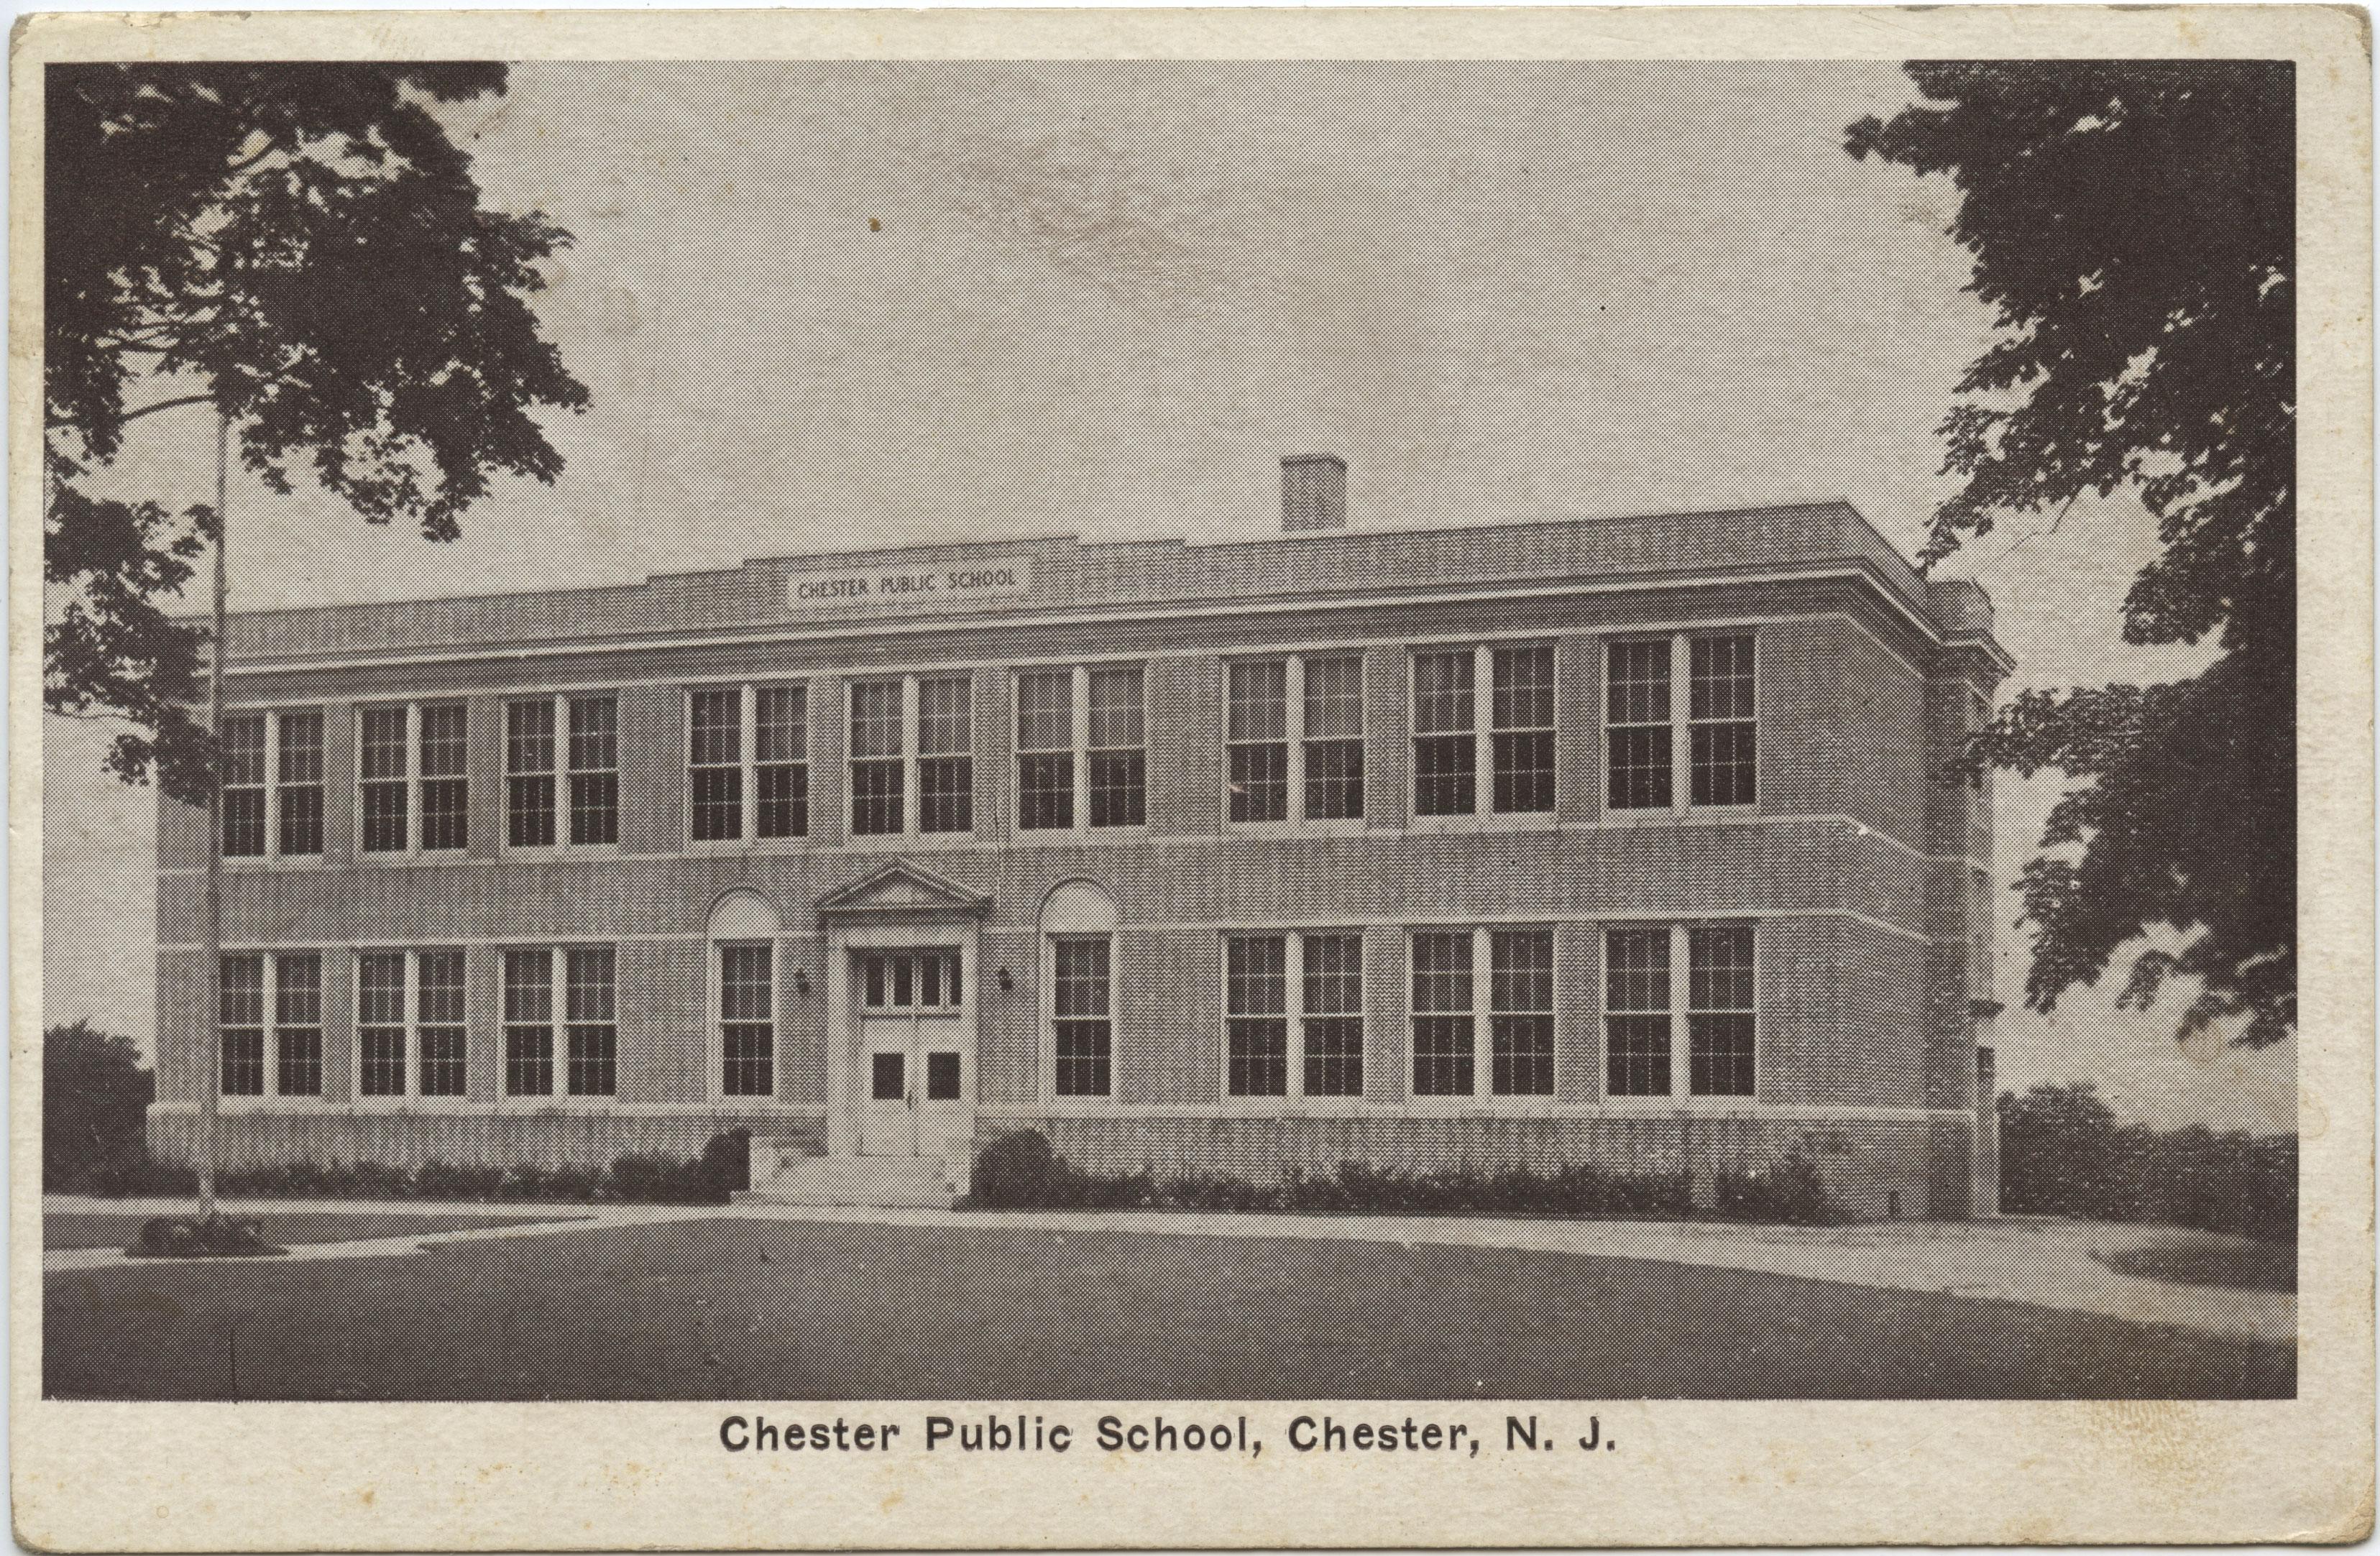 Chester Public School or Williamson School